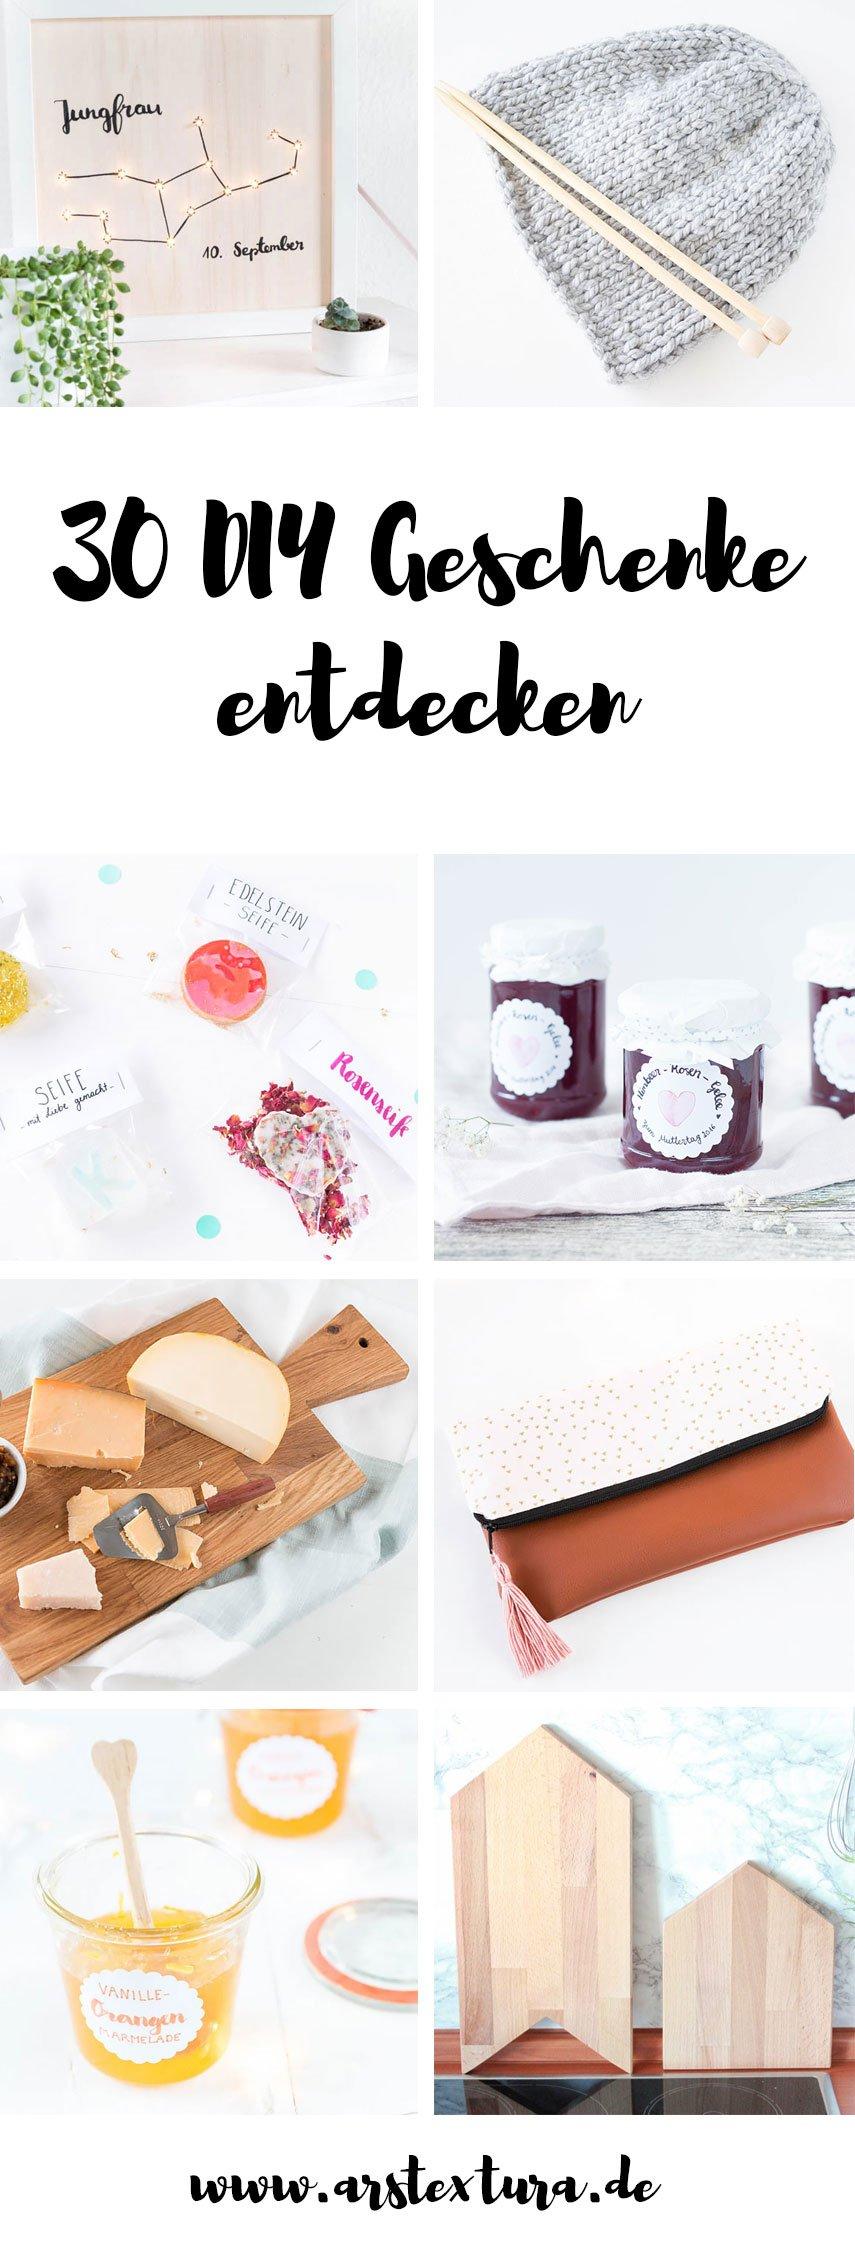 diy geschenke ars textura diy blog food bastelideen rezepte. Black Bedroom Furniture Sets. Home Design Ideas